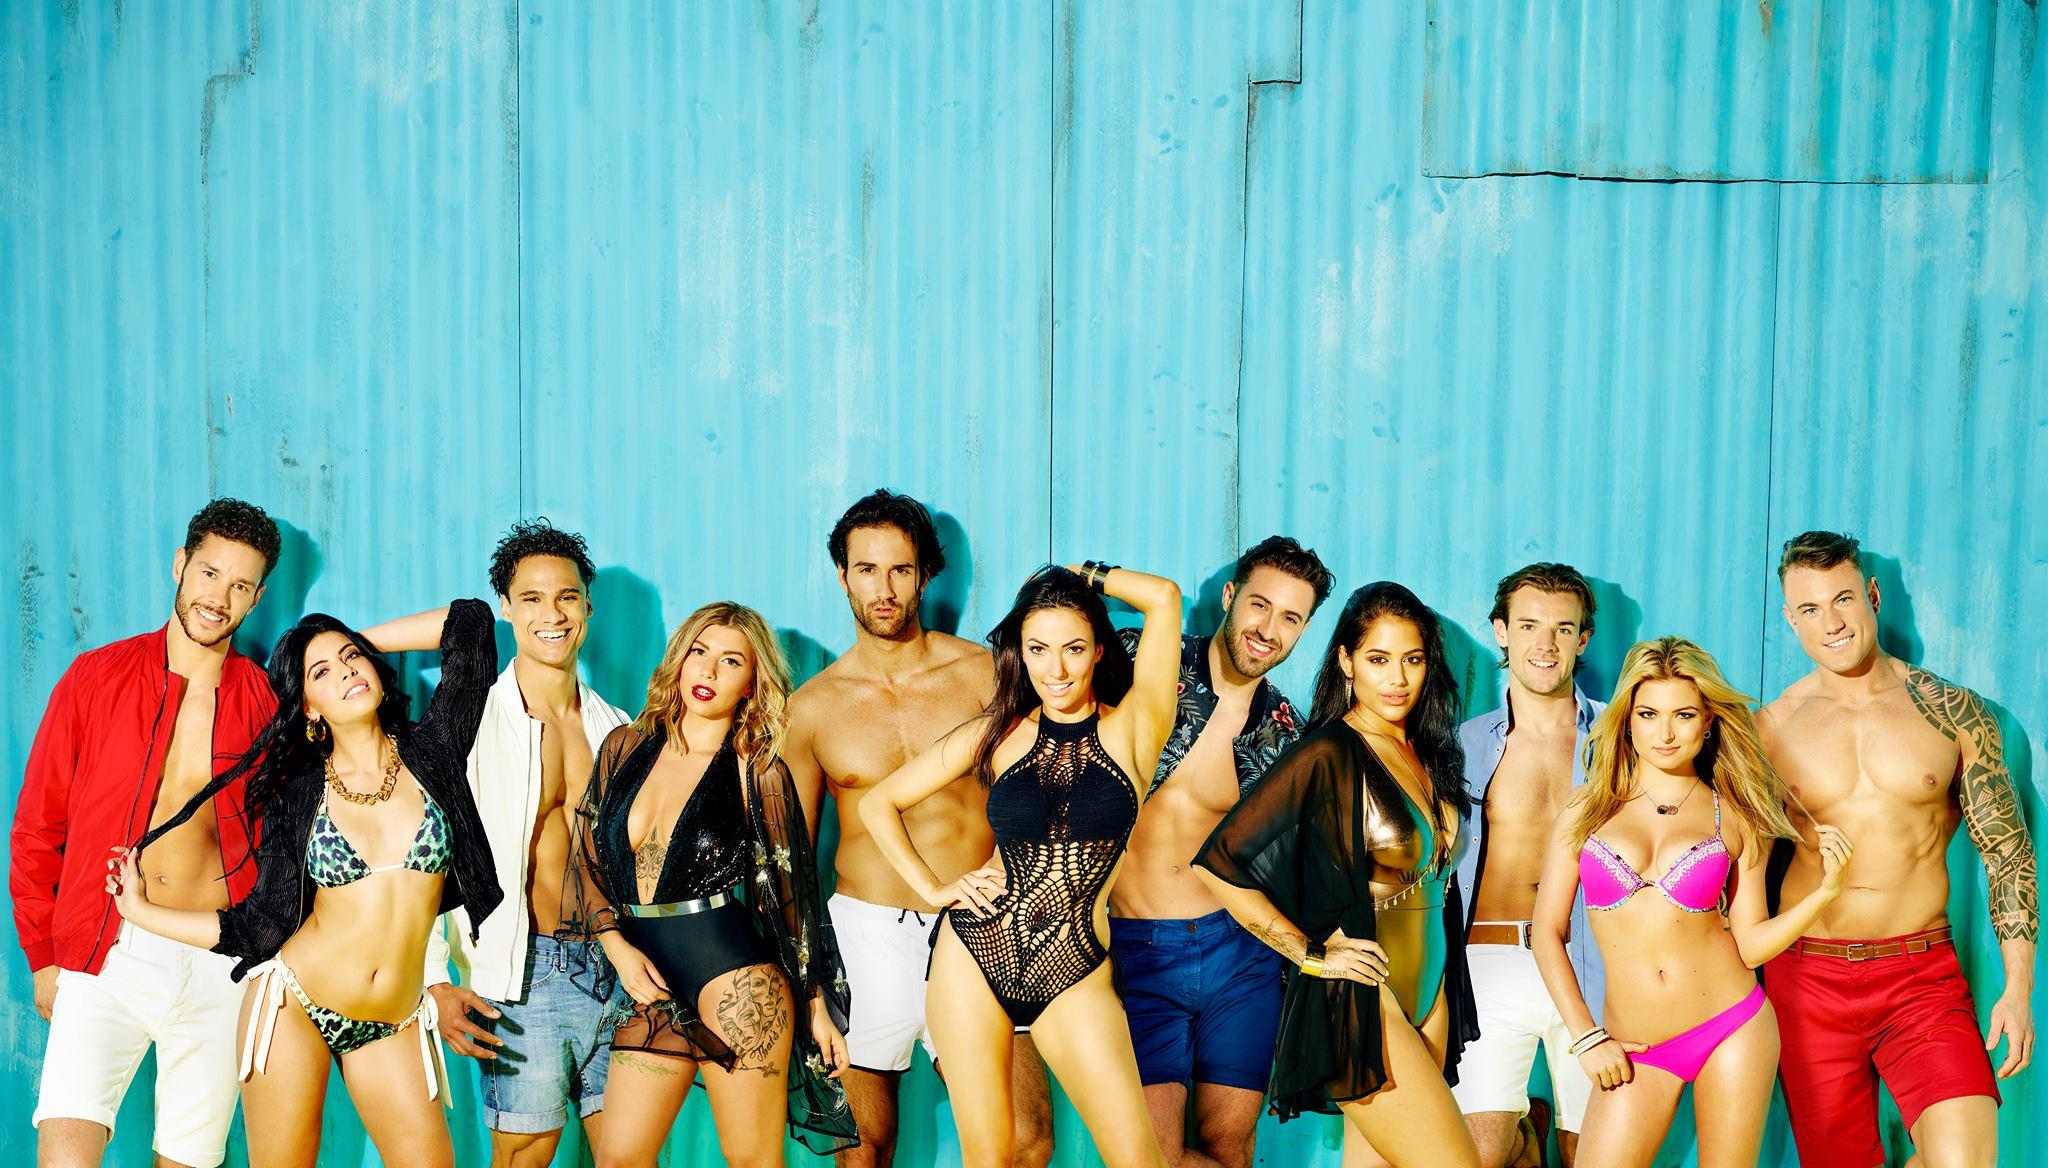 Love Island cast 2016